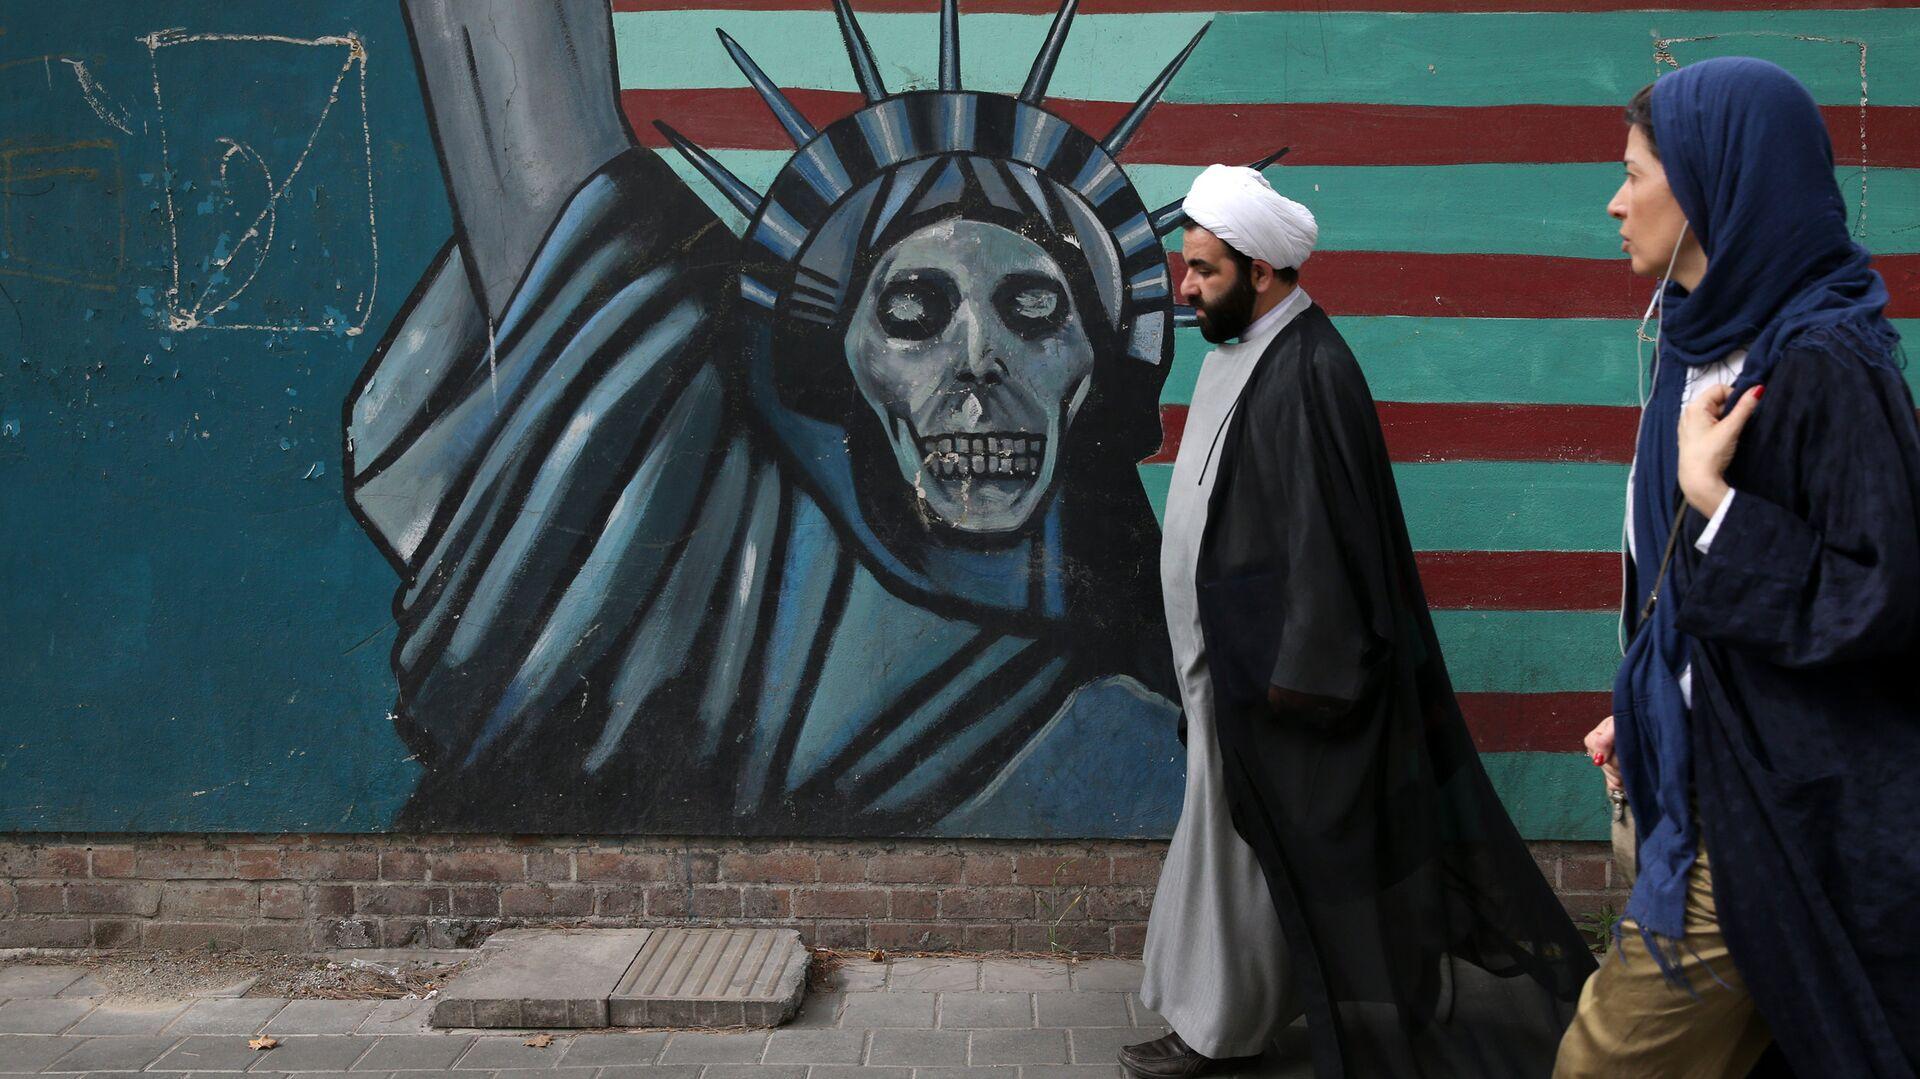 Антиамериканский рисунок в Тегеране - РИА Новости, 1920, 23.01.2021